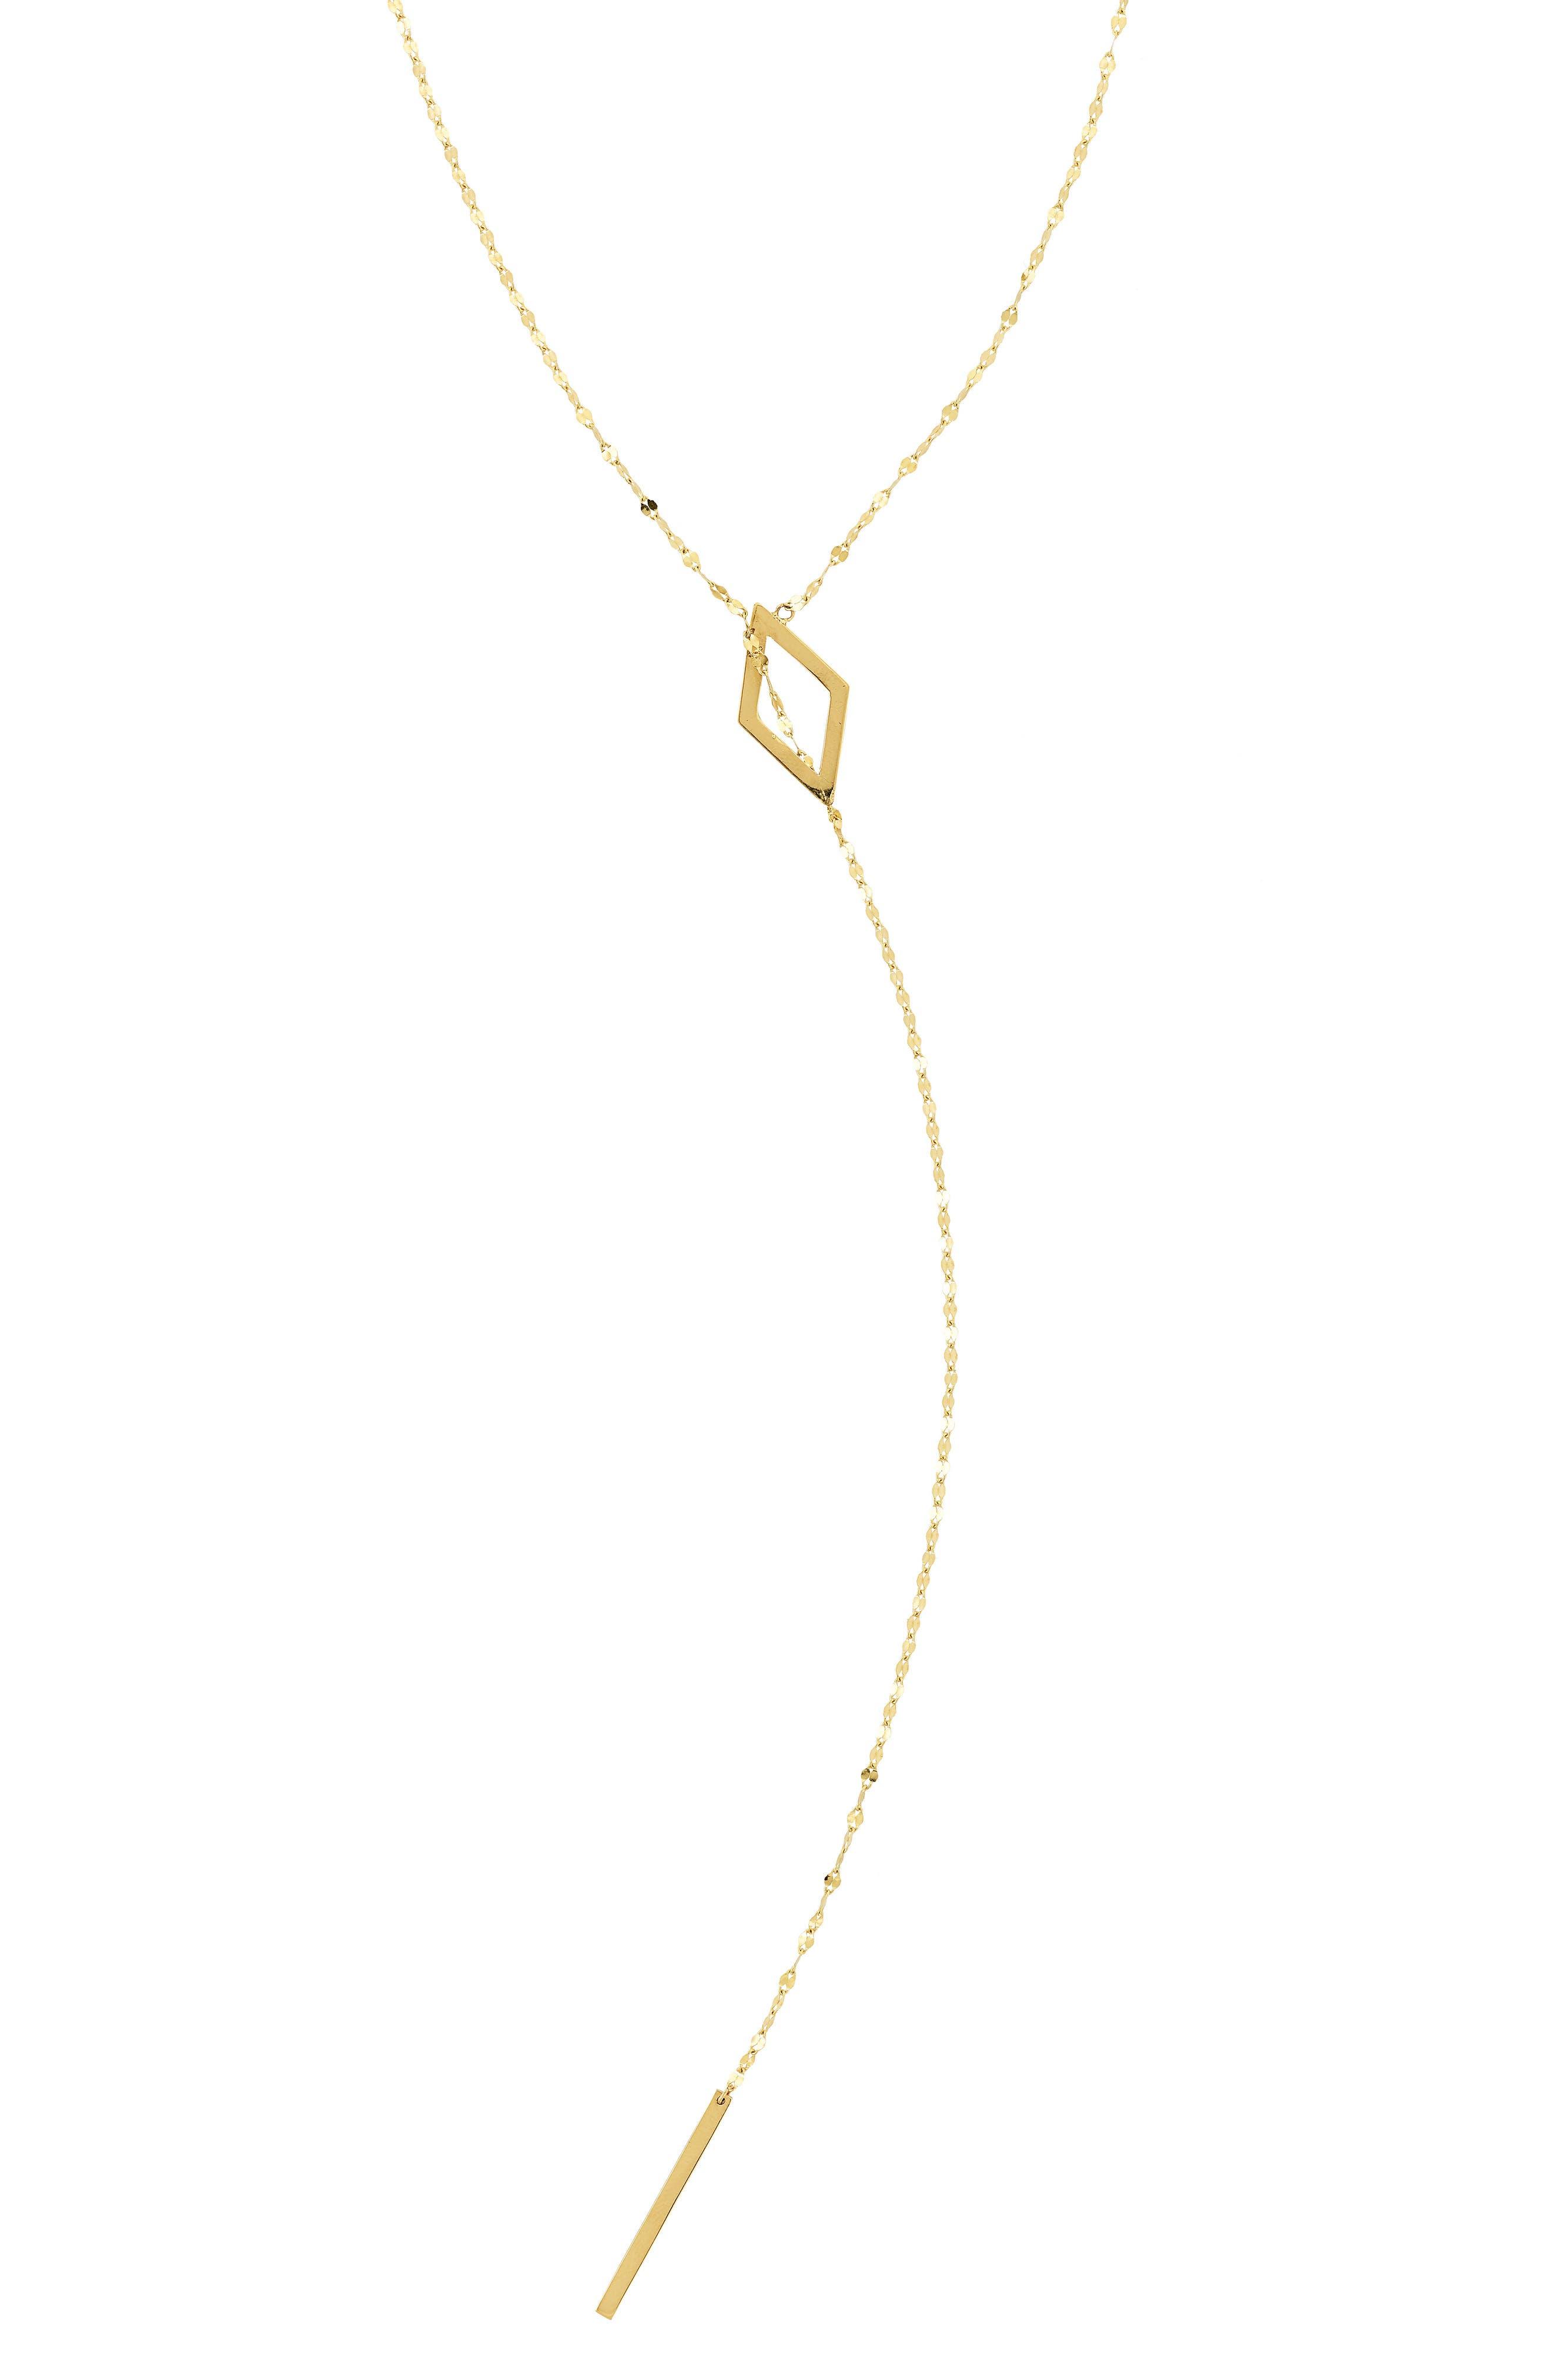 Alternate Image 1 Selected - Lana Jewelry Lariat Necklace